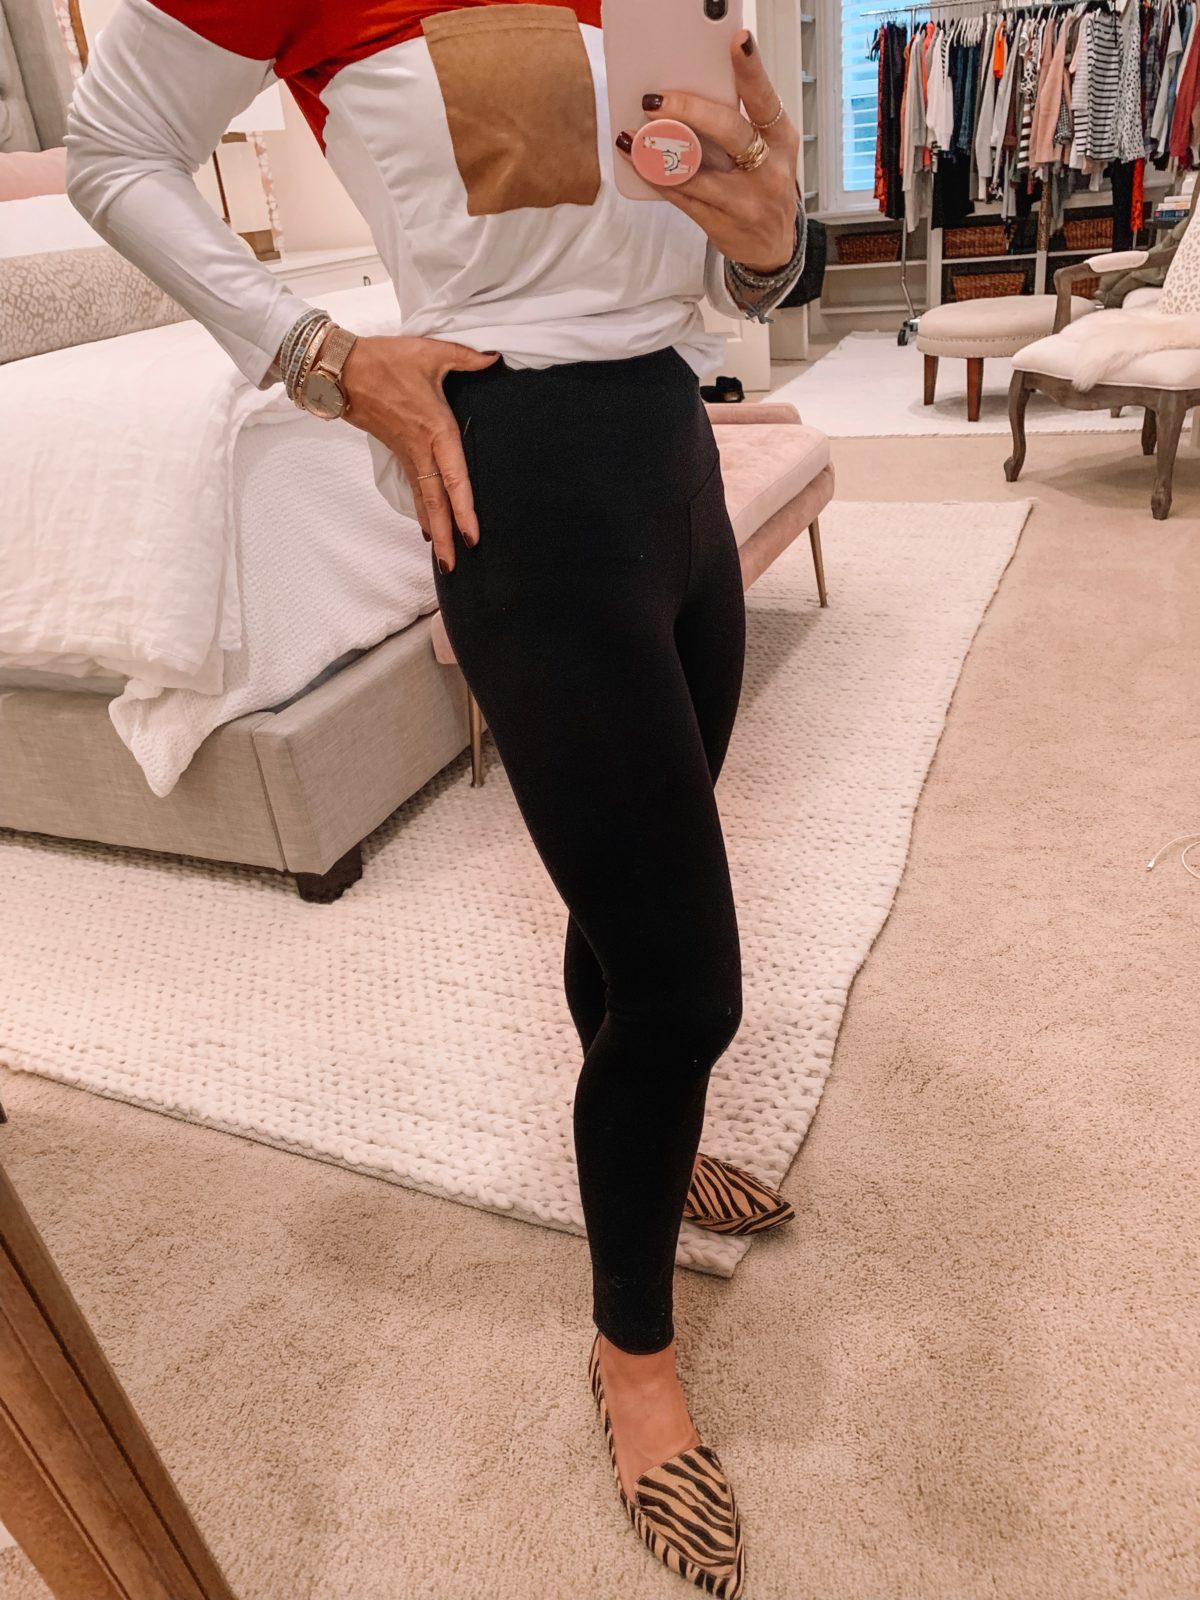 Amazon fashion haul, leggings